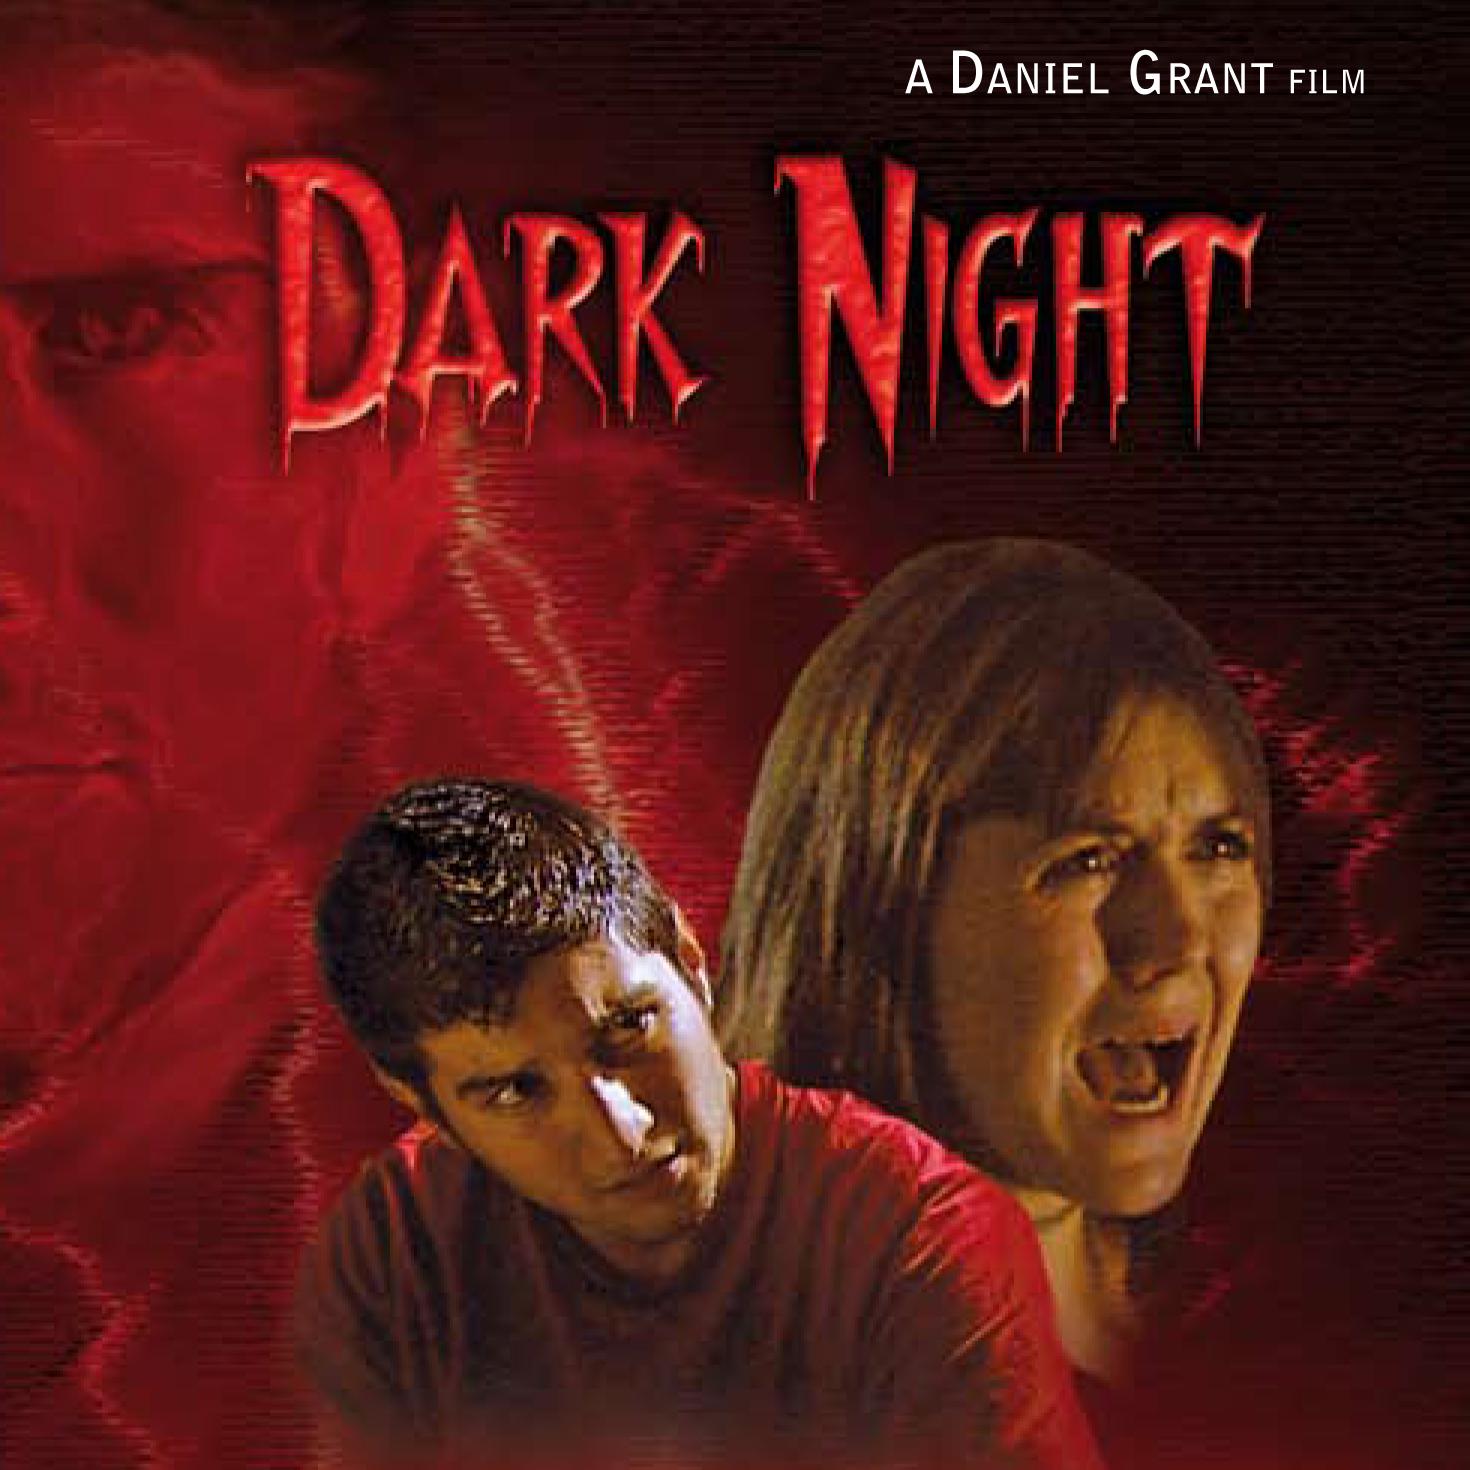 Spiffing Films, Dark Night - theme tune lyrics by lyricist Arron Storey